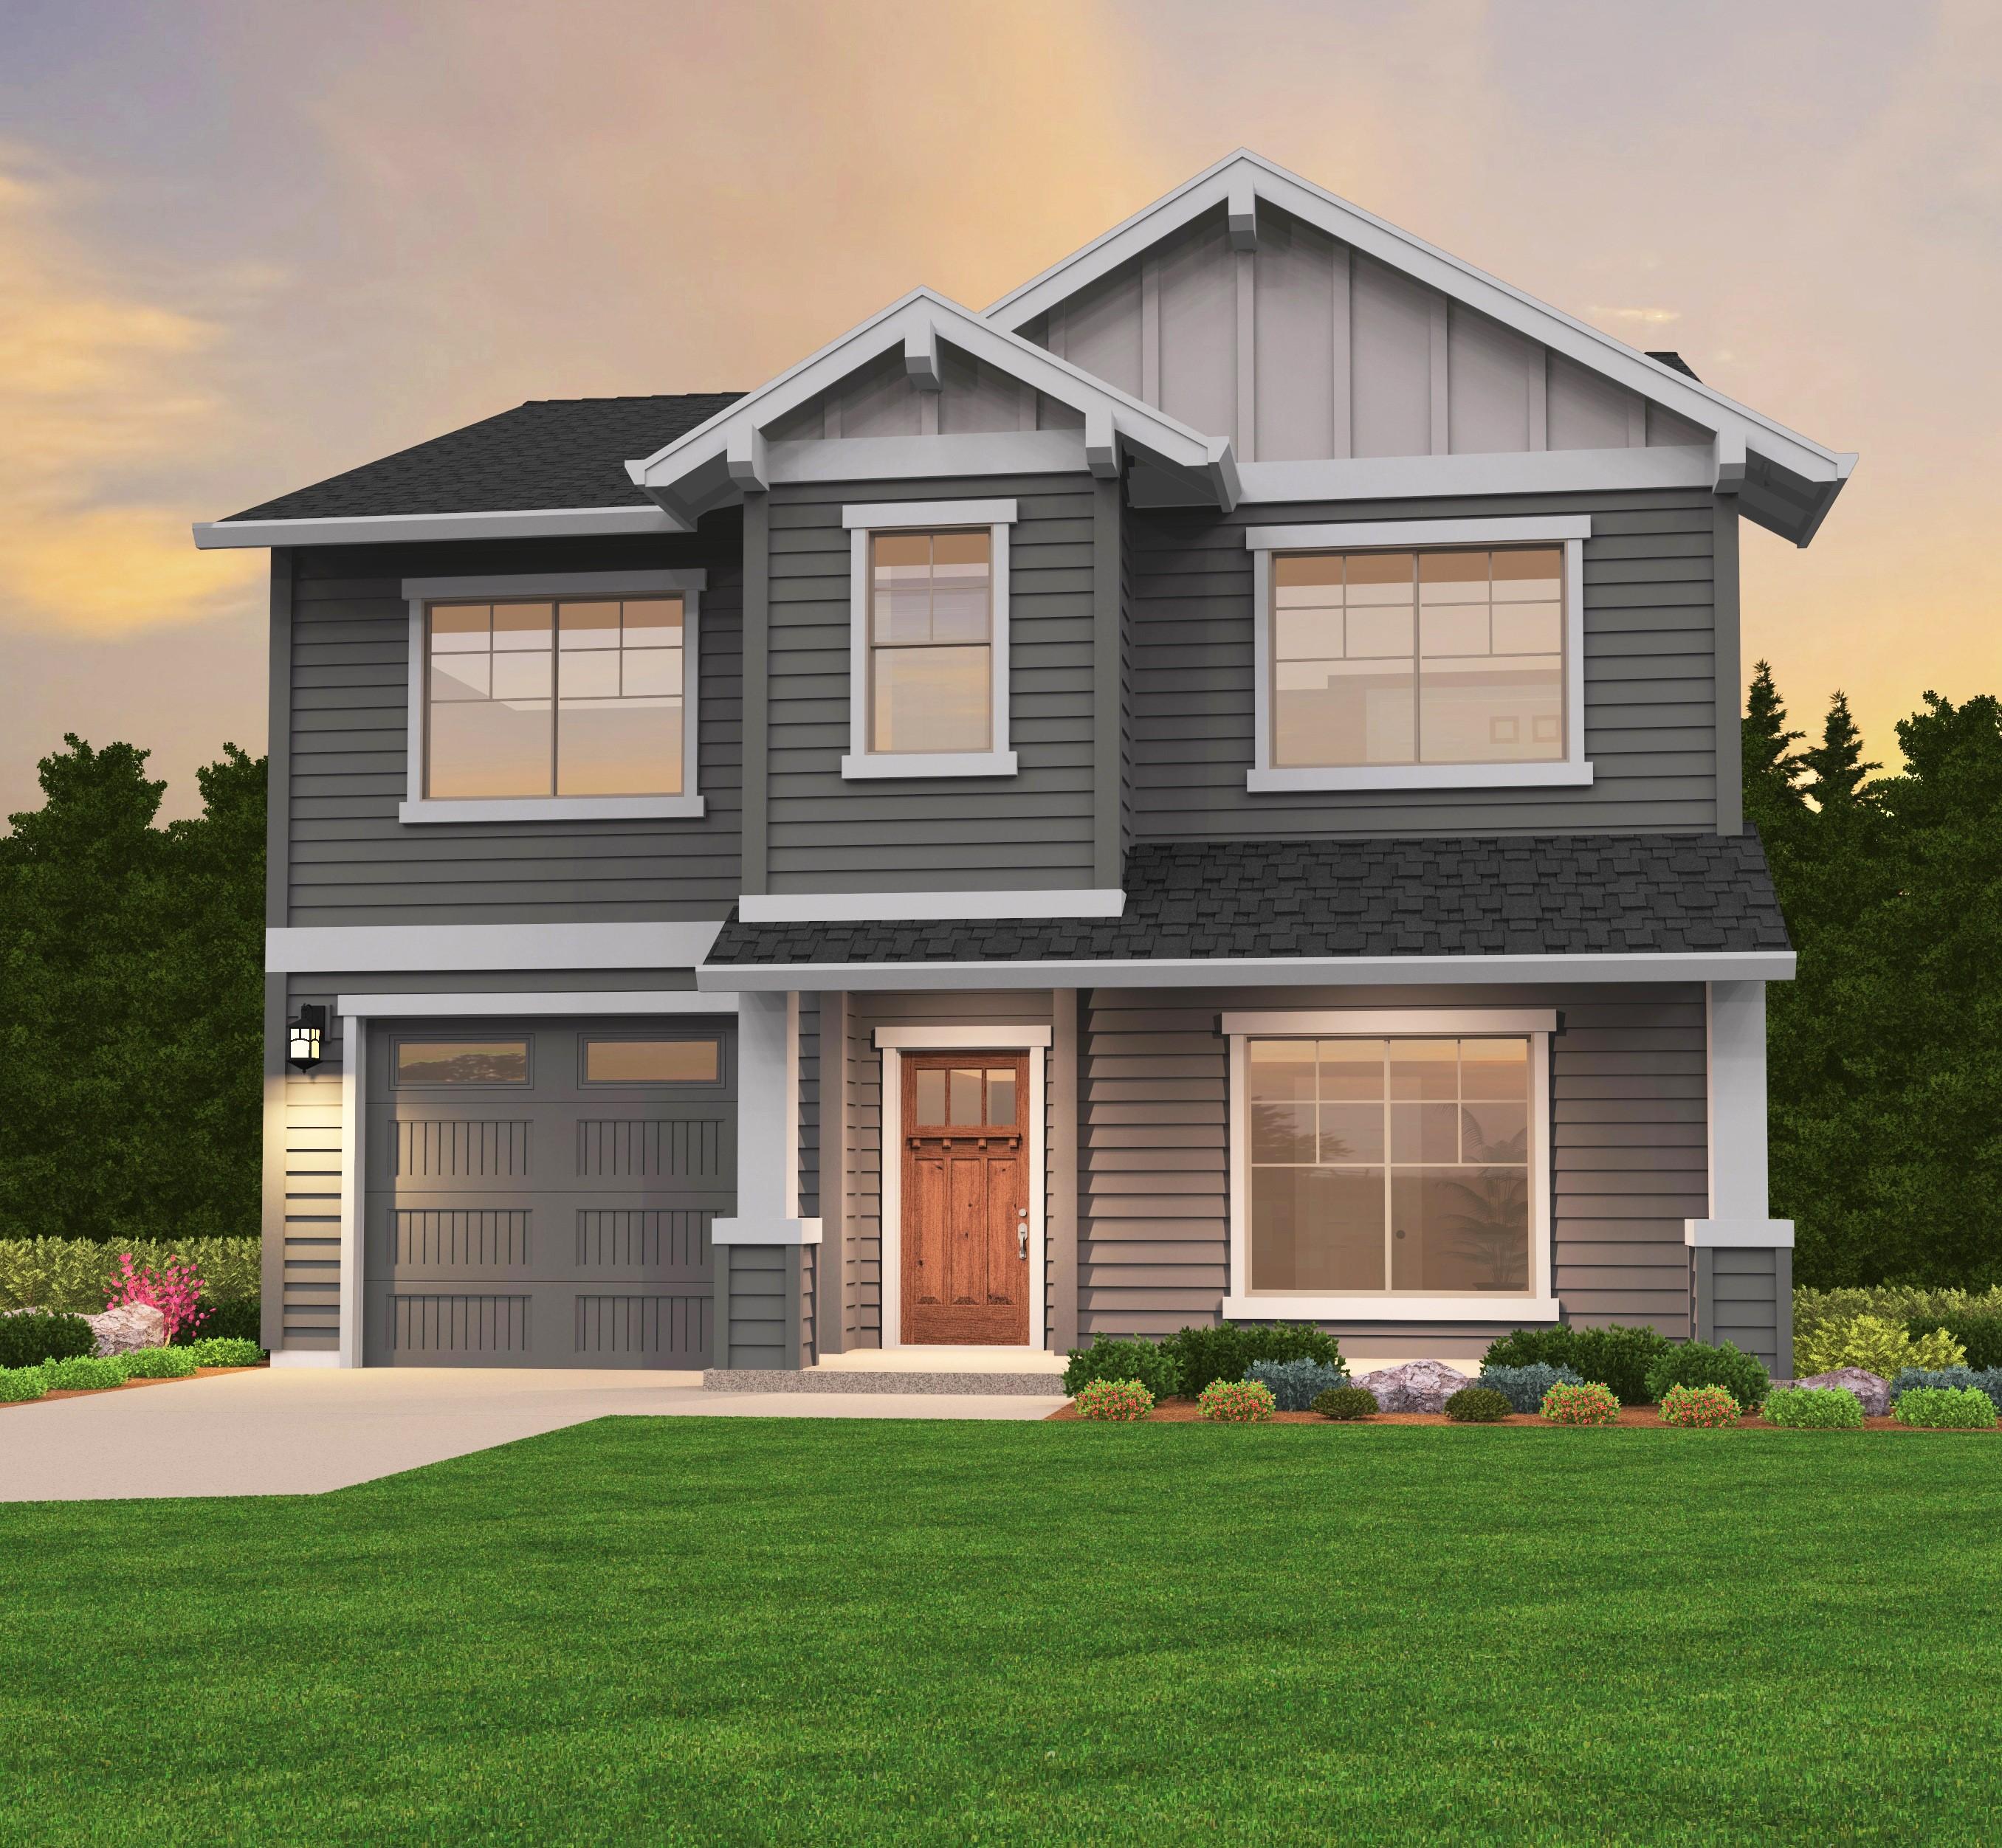 Glenview 5 House Plan | Craftsman House Plans